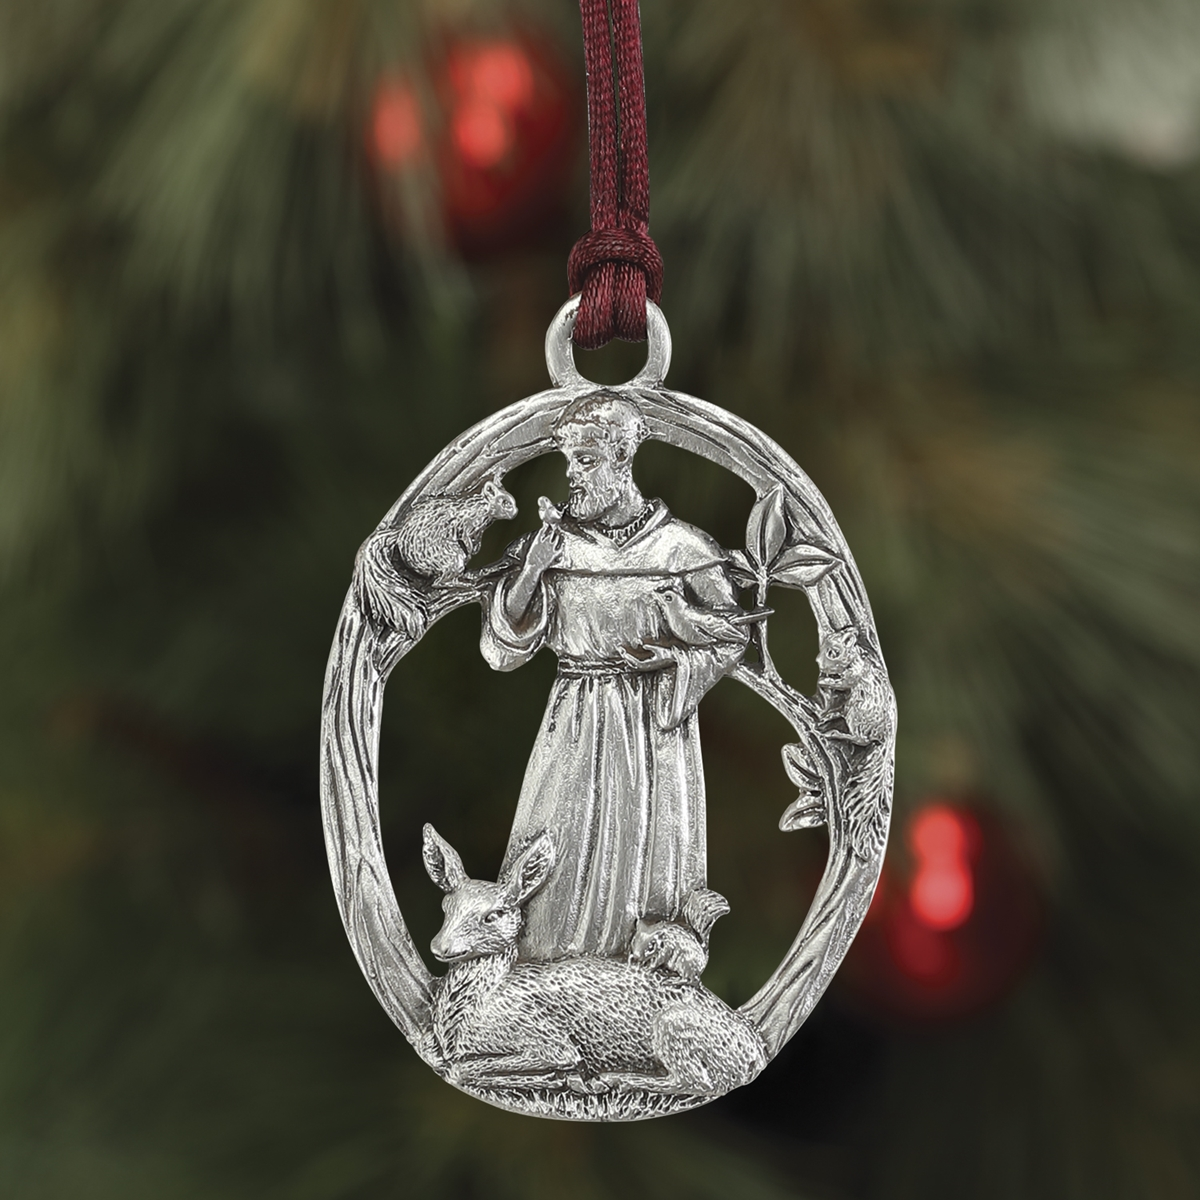 St Francis Plant a Tree Ornament